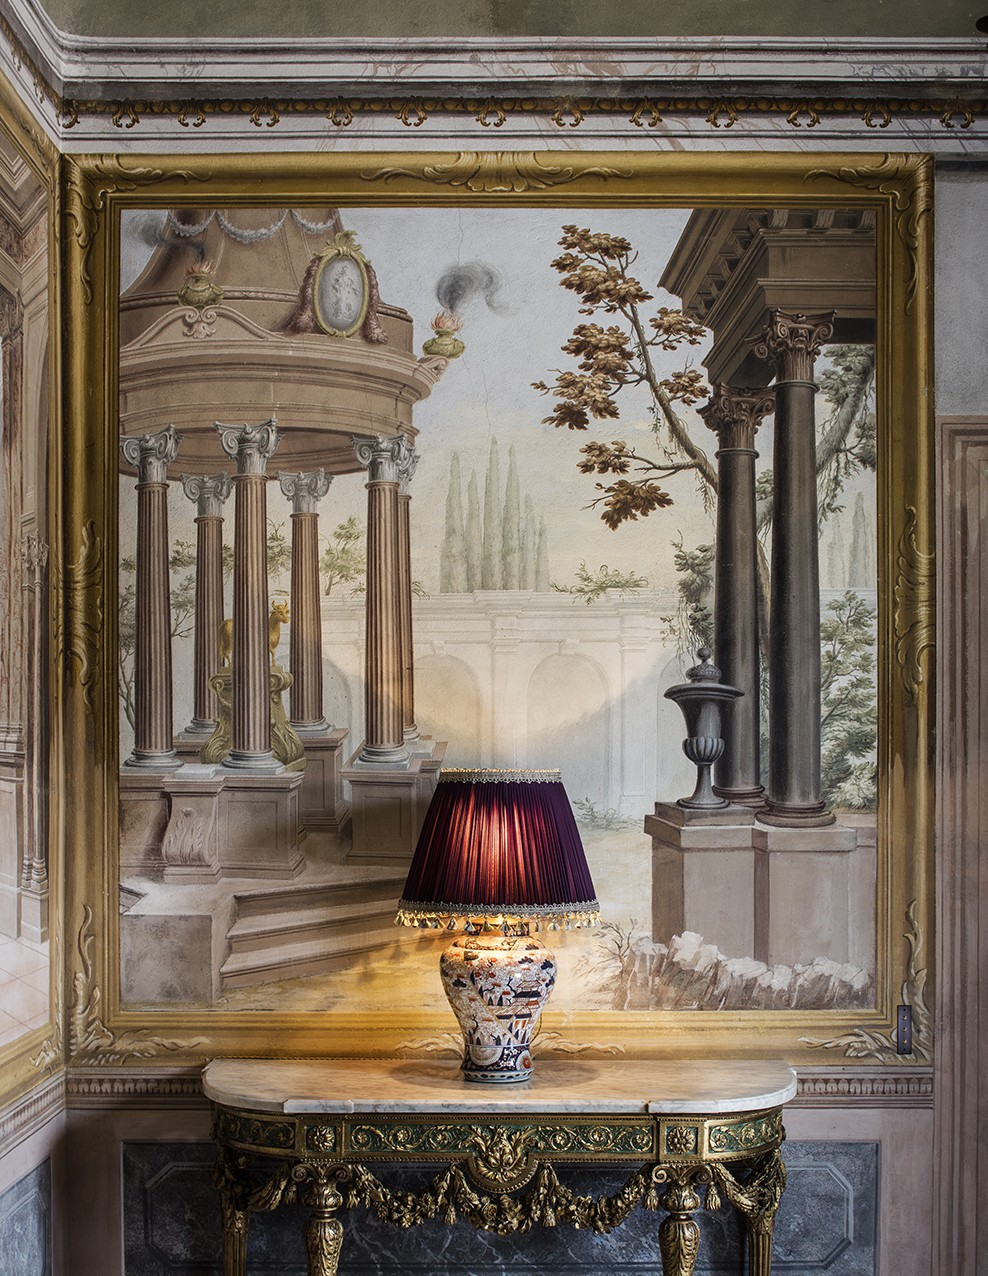 Villa Balbiano best luxury property Lake Como Milan Durini private residence garden swimming pool bedrooms suites 4 floors